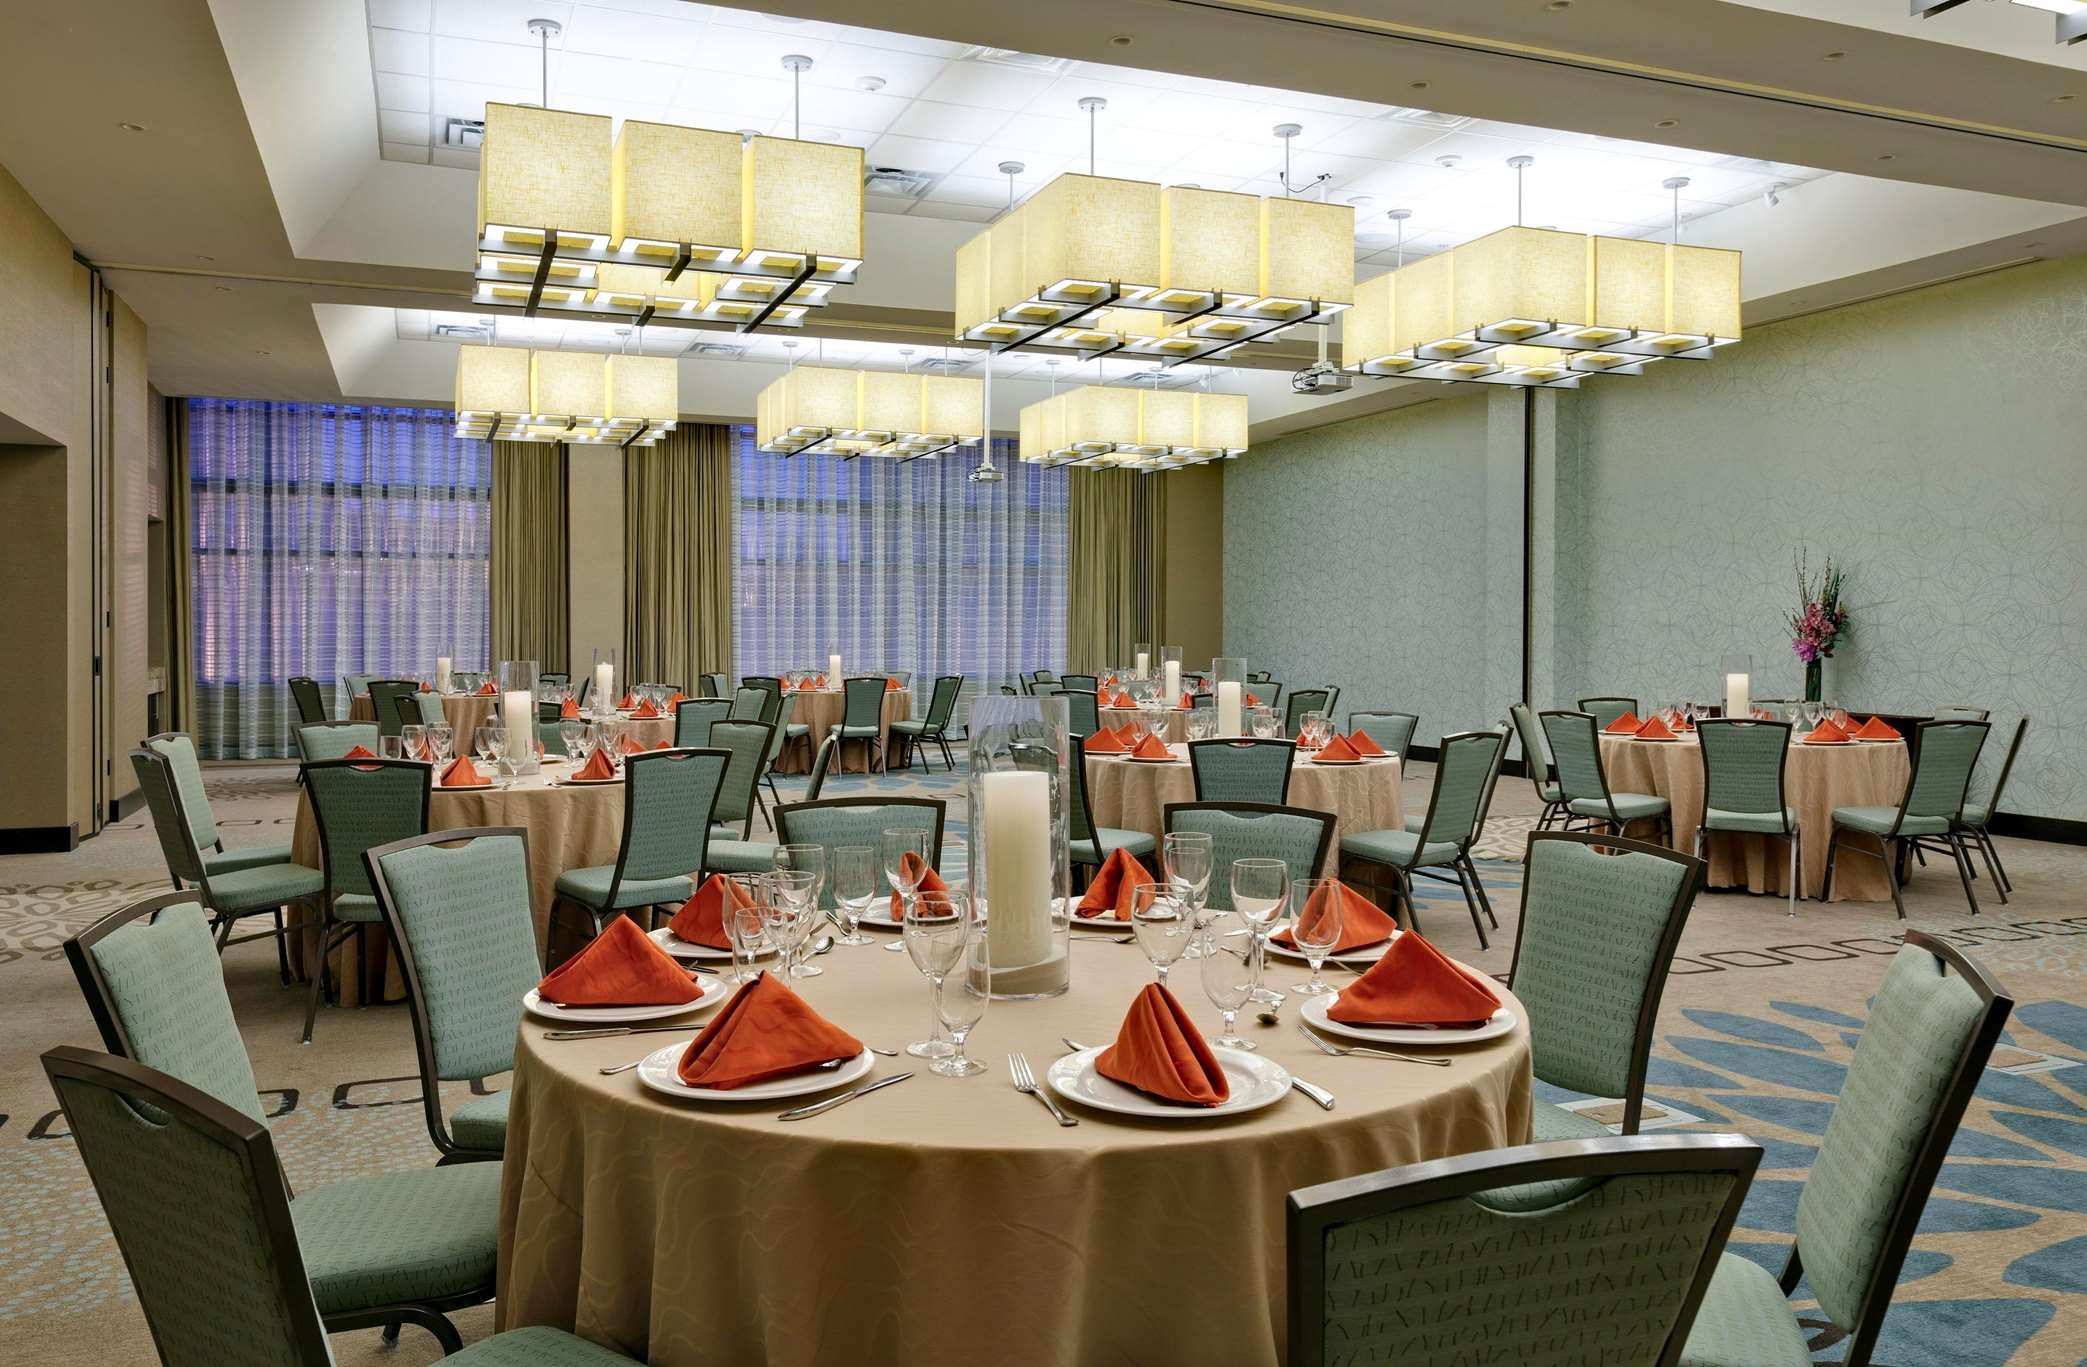 Hilton Garden Inn Washington DC/U.S. Capitol image 3